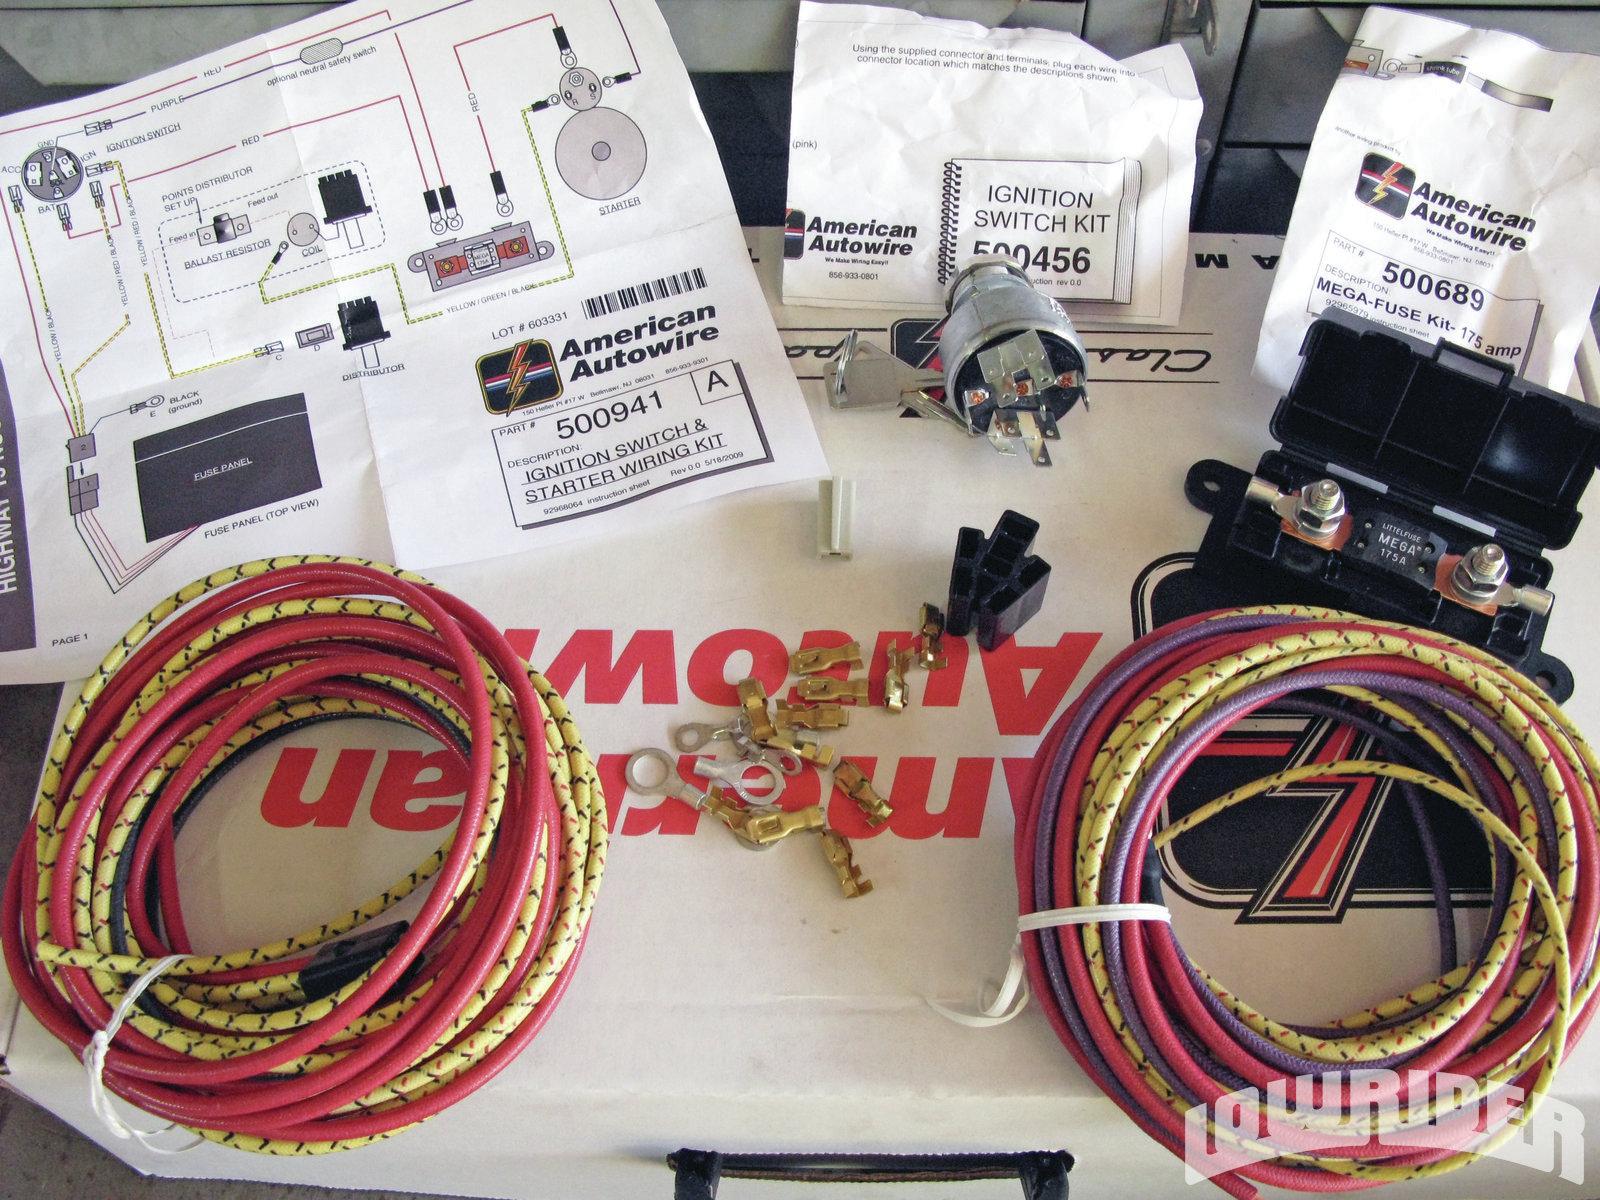 Highway 15 Wiring Harness Diagram American Auto Wire Autowire Nostalgia Kit Lowrider Magazinehighway 7